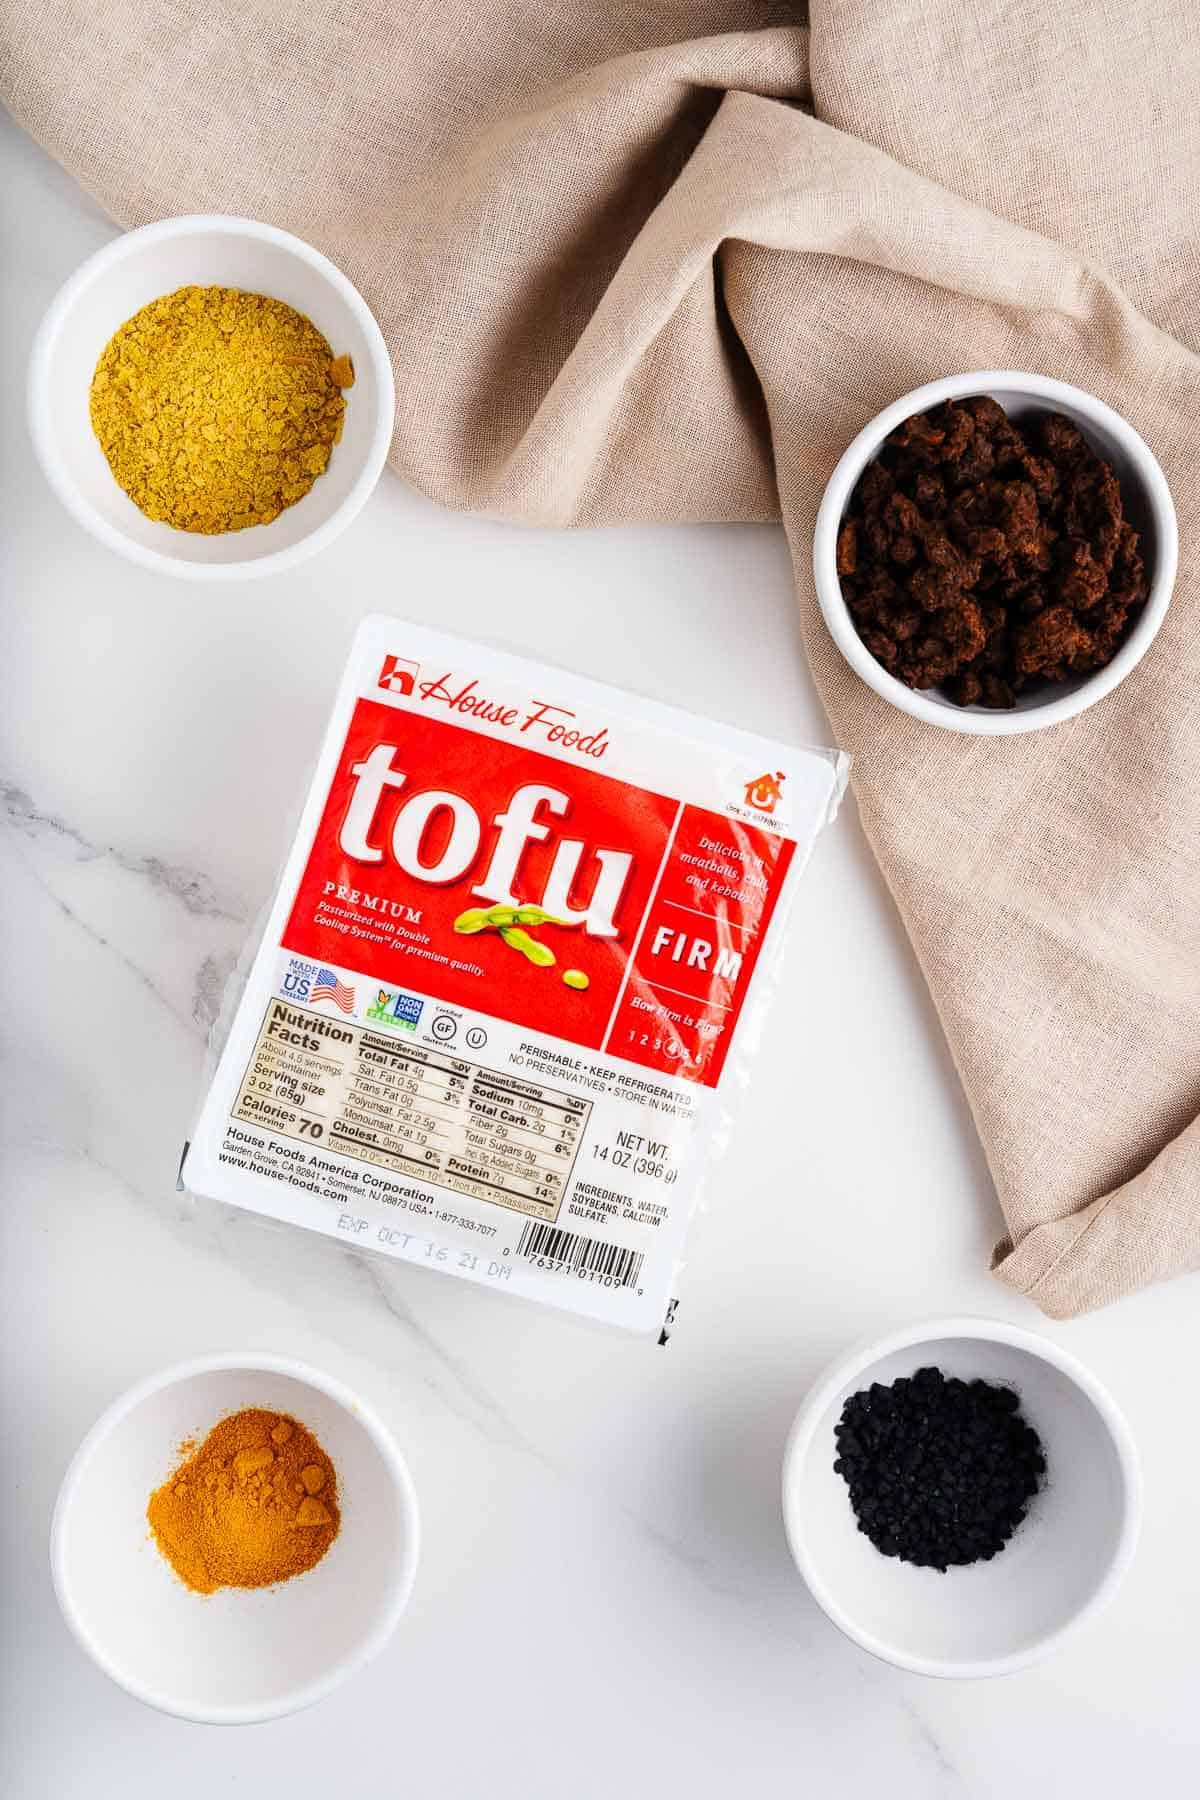 Tofu, Nutritional Yeast, Turmeric, Black Salt, and Chorizo